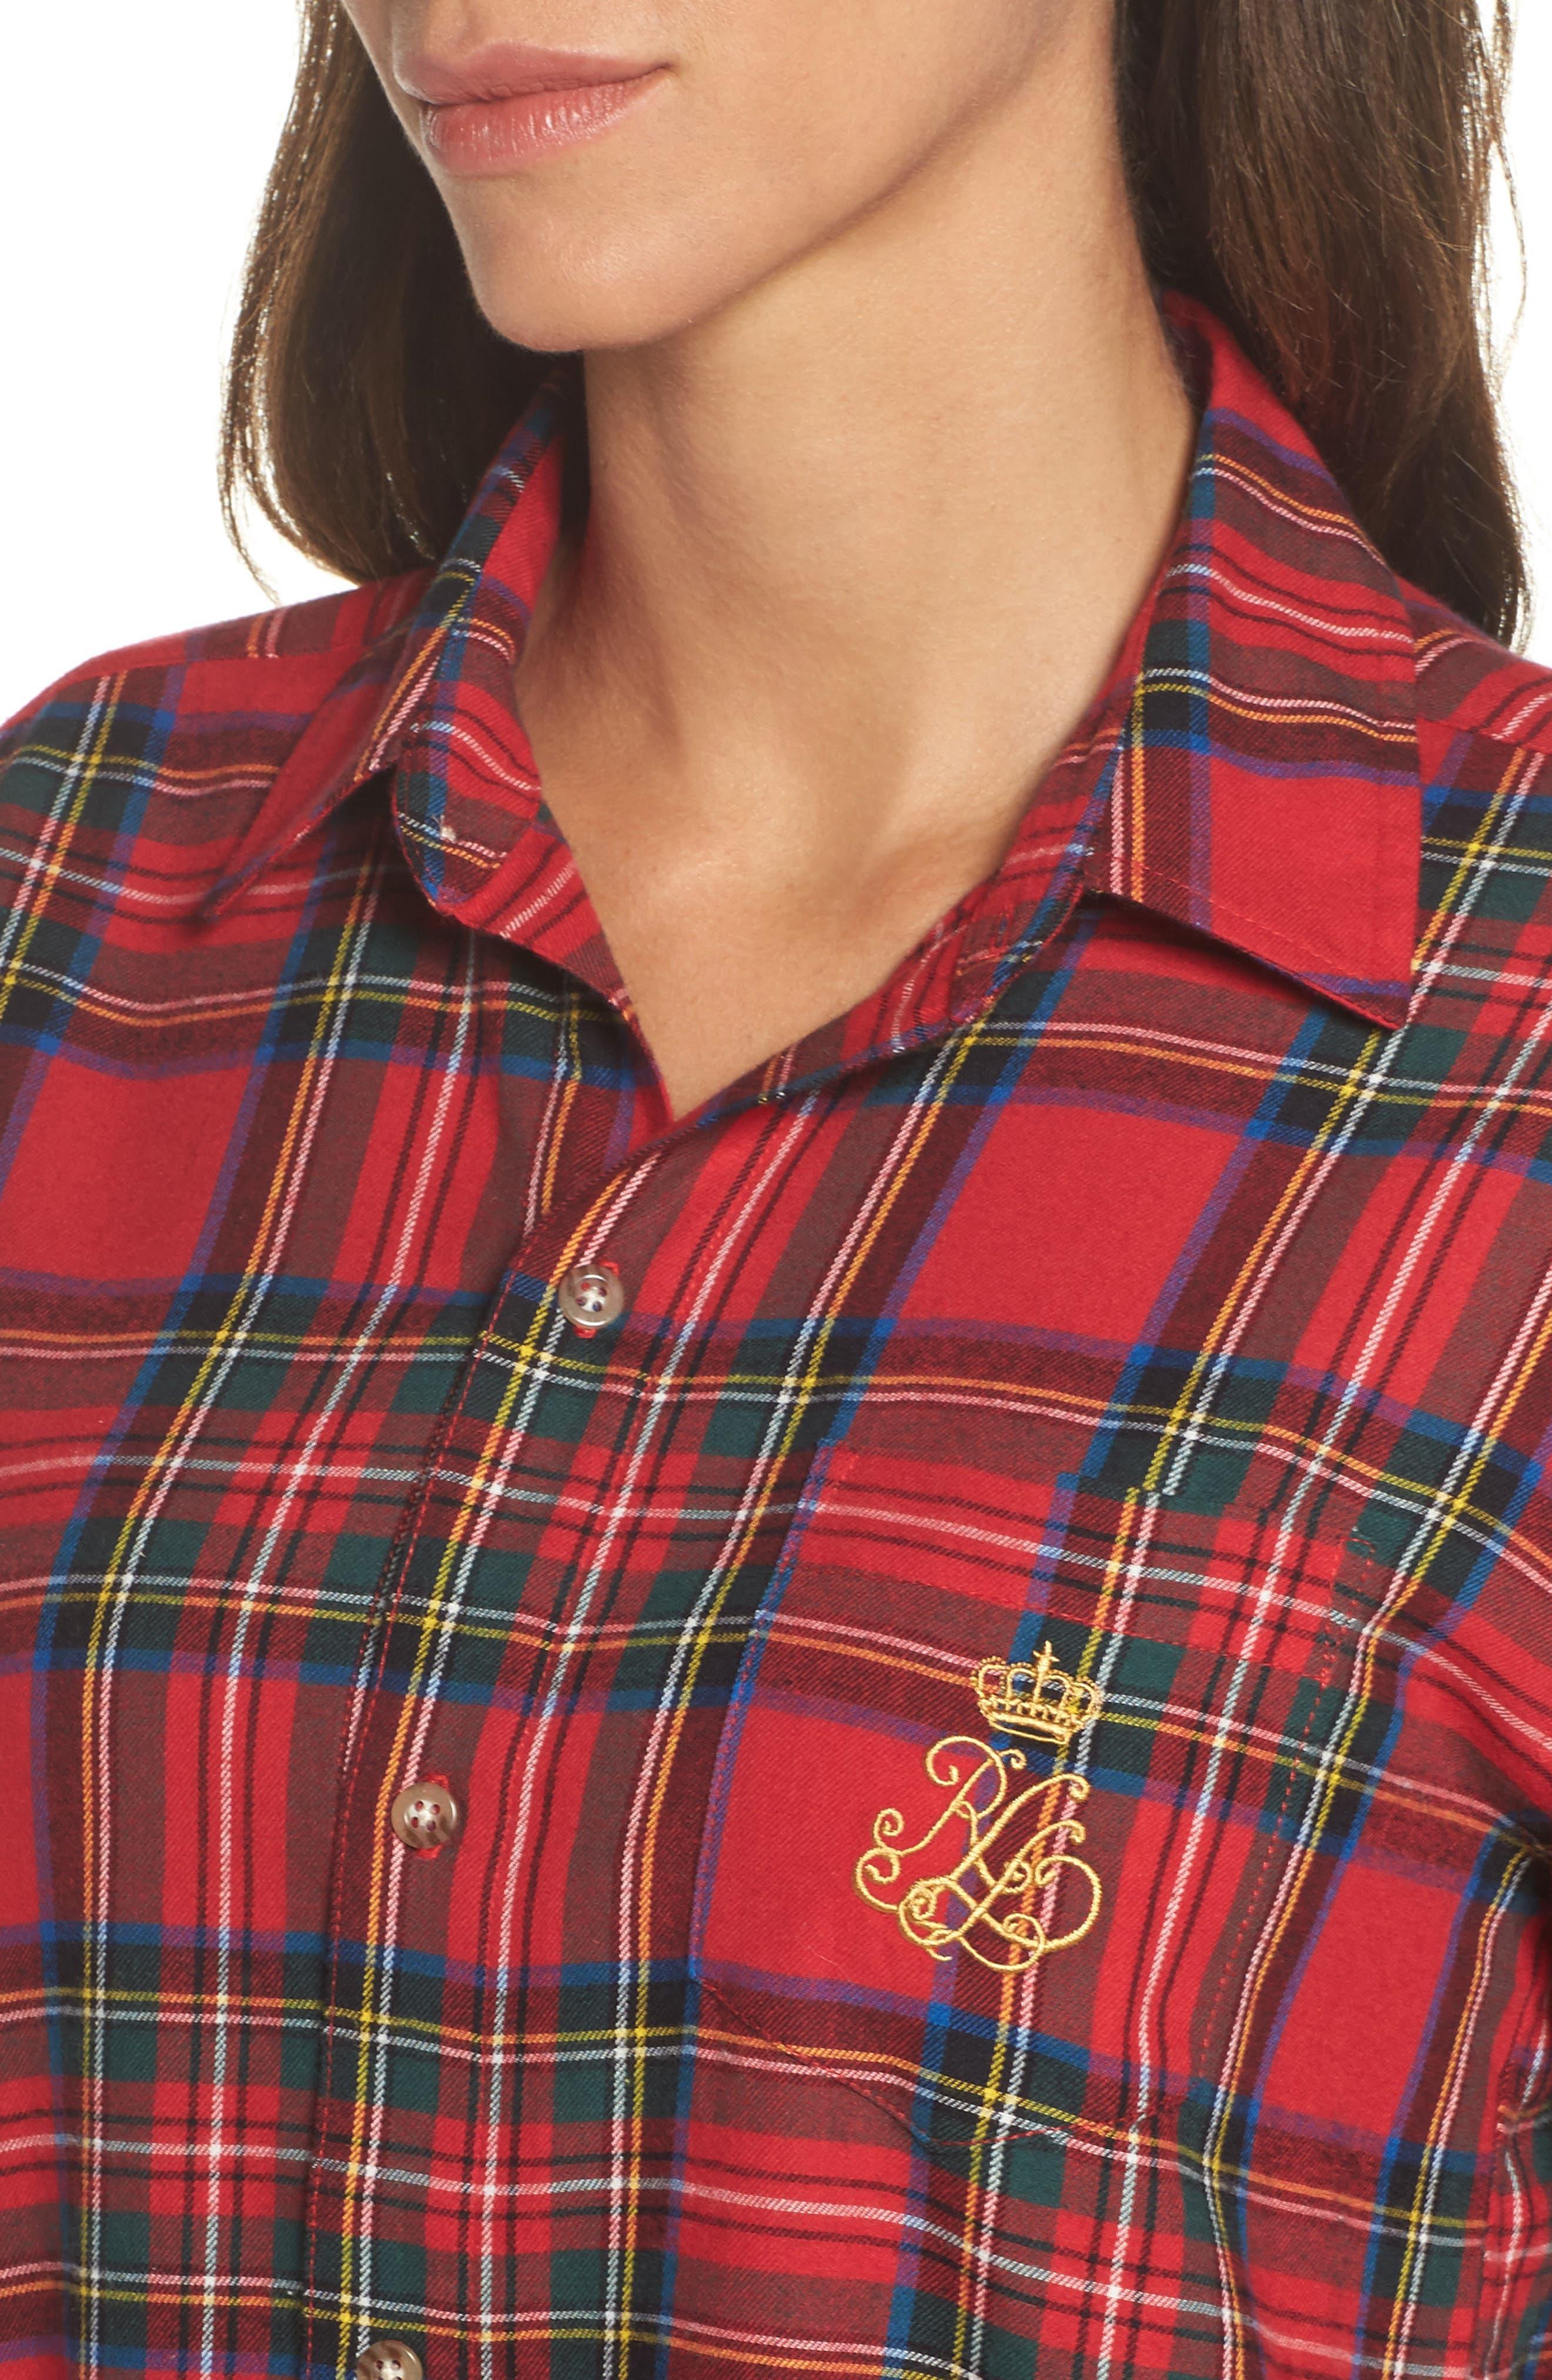 Flannel Sleep Shirt,                             Alternate thumbnail 14, color,